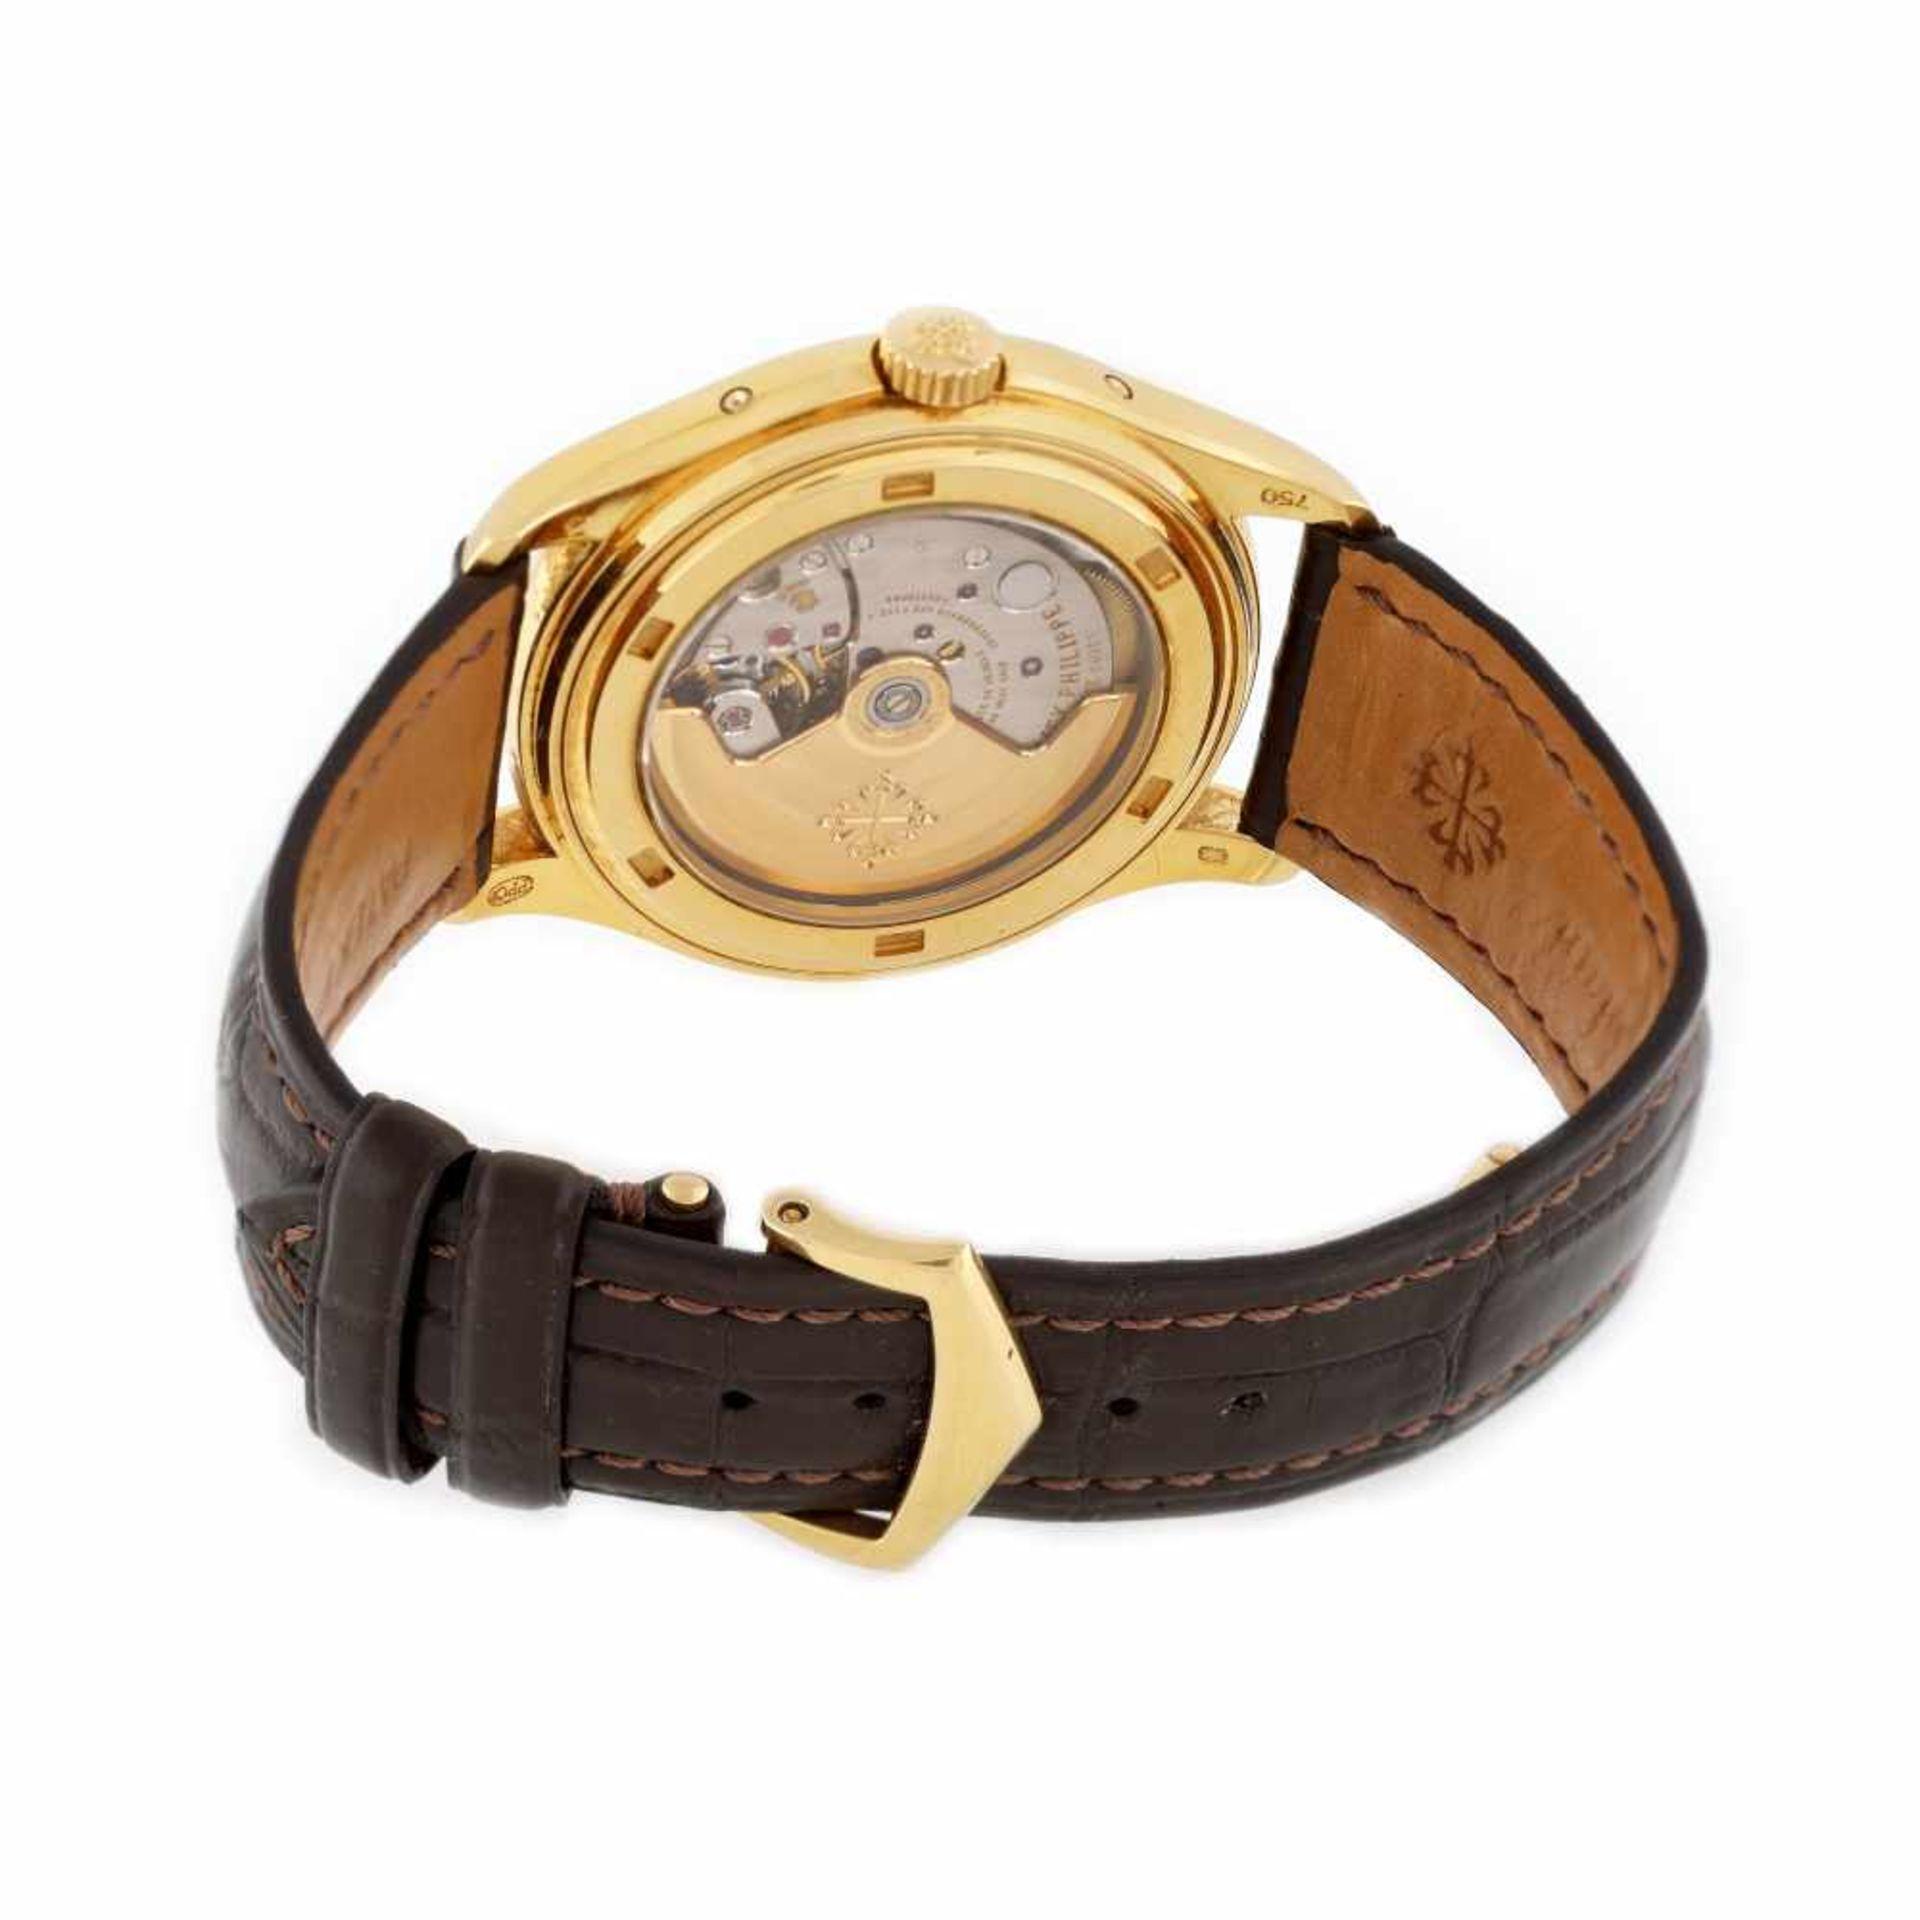 Patek Philippe Annual Calendar Moon Phase wristwatch, gold, men, provenance documents and original b - Bild 3 aus 4